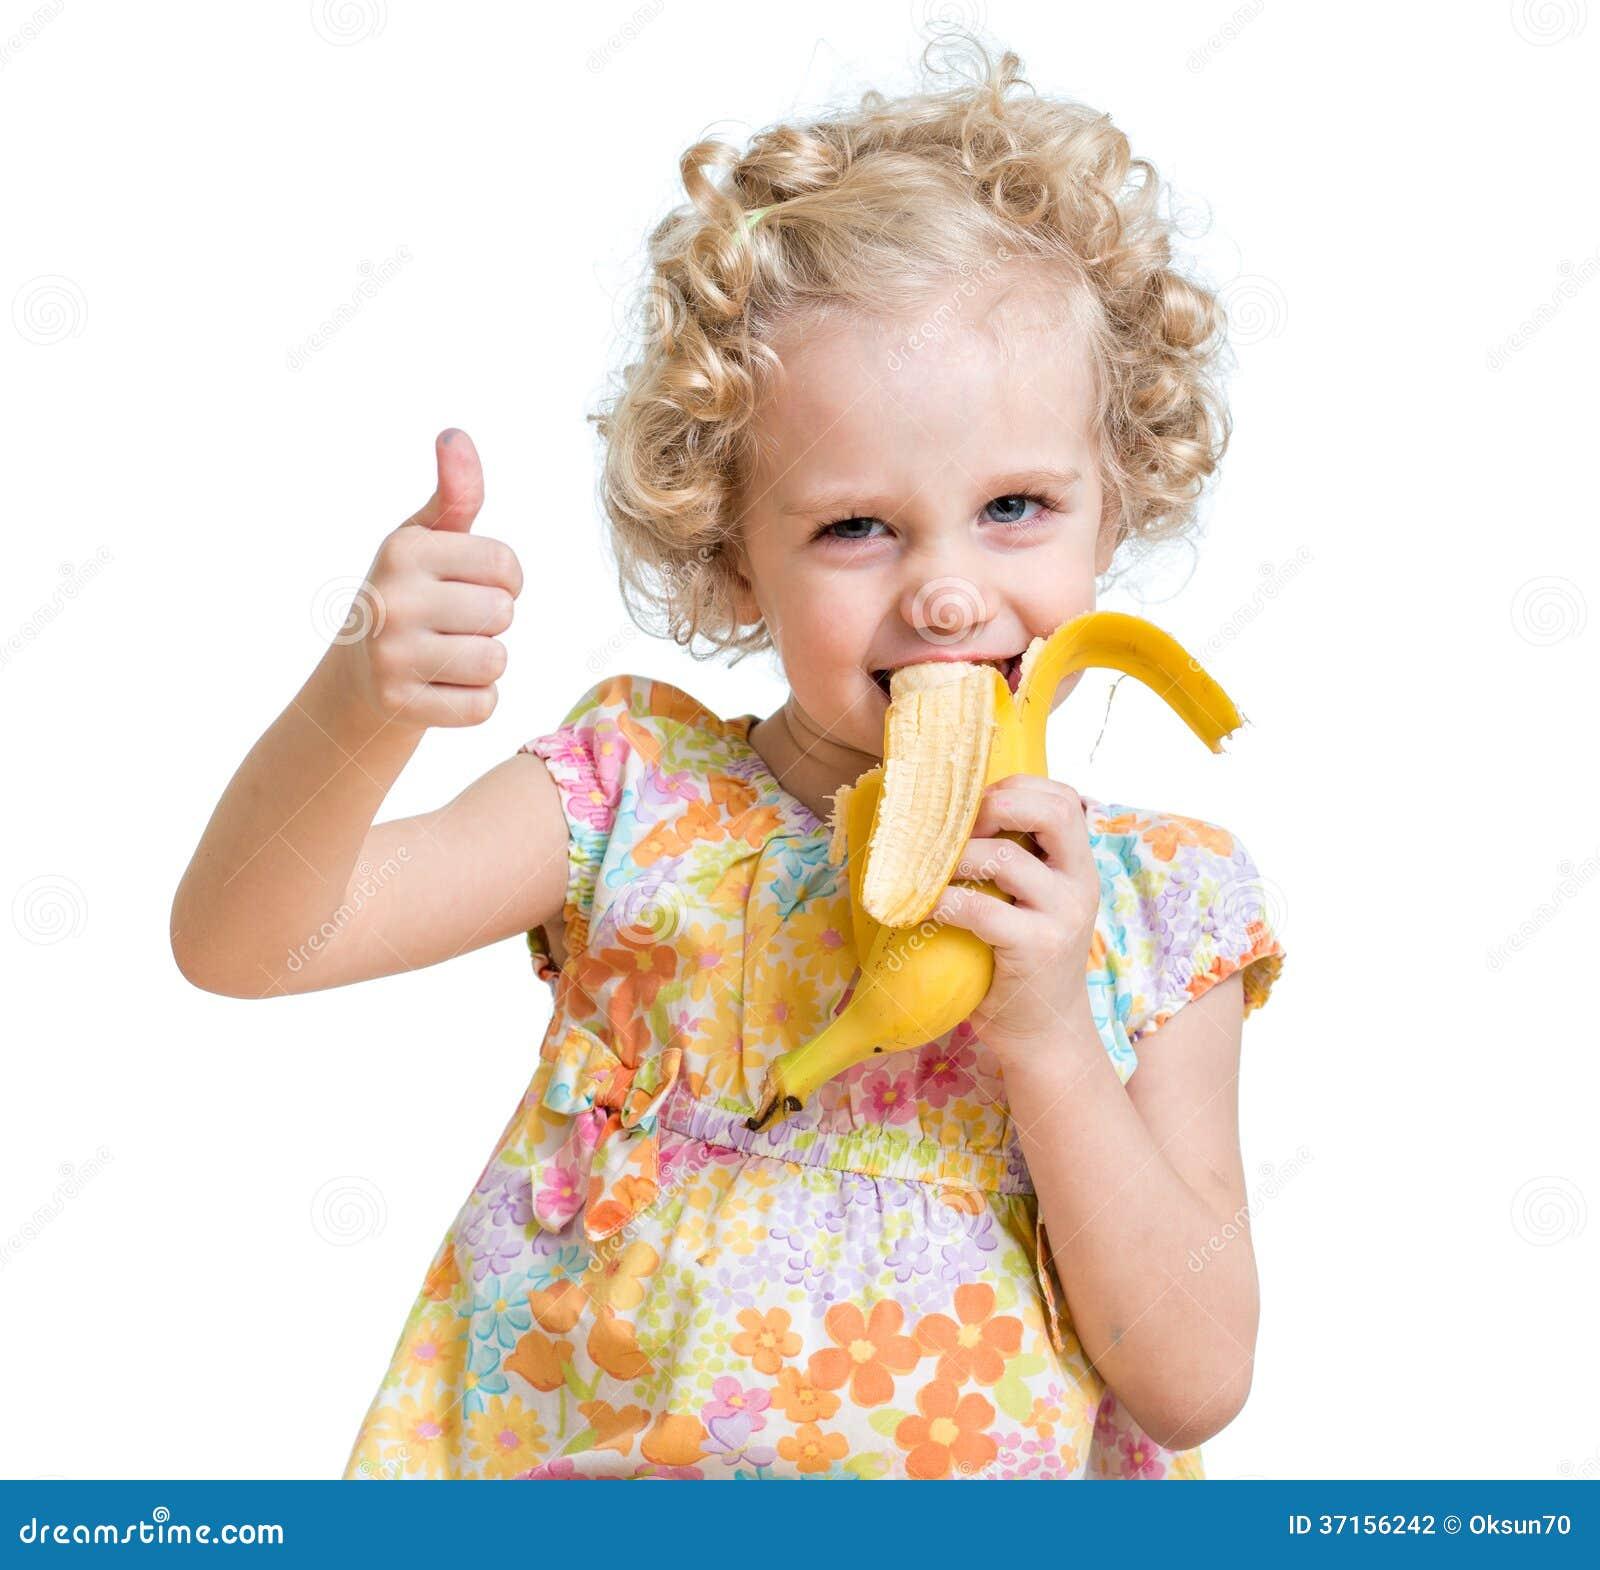 мальчик ест банан фото